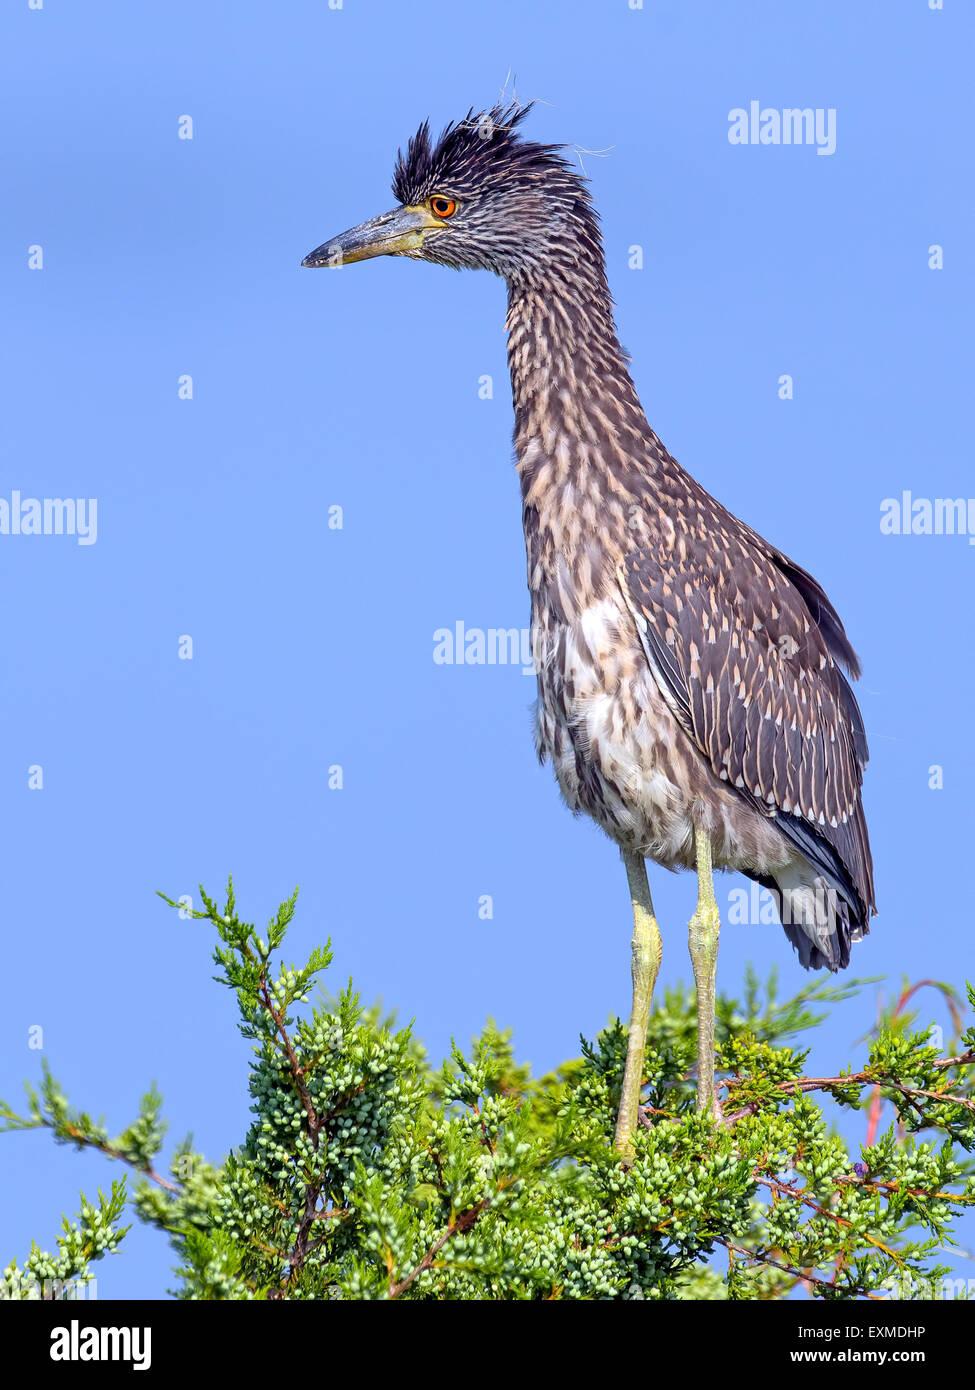 Juvenile Black-crowned Night Heron standing i tree tops. - Stock Image